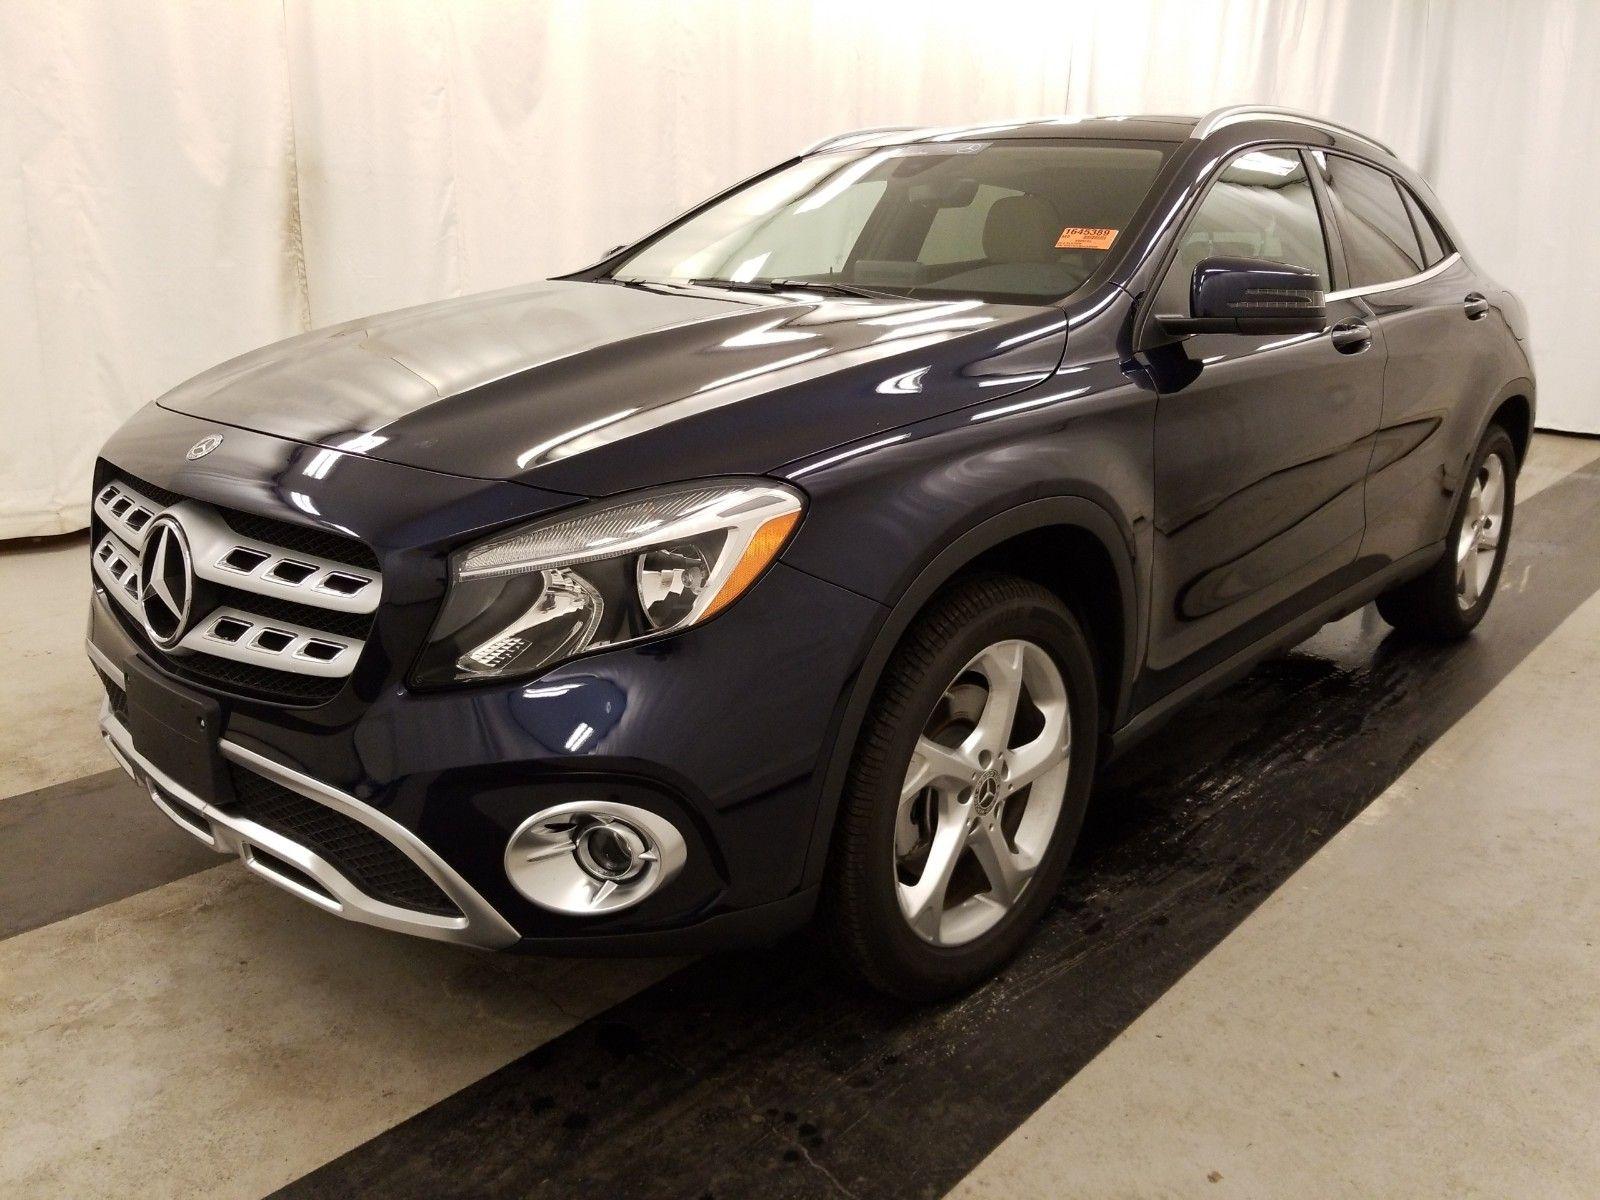 2018 Mercedes-benz Gla 2.0. Lot 99912027335 Vin WDCTG4EB8JJ395688